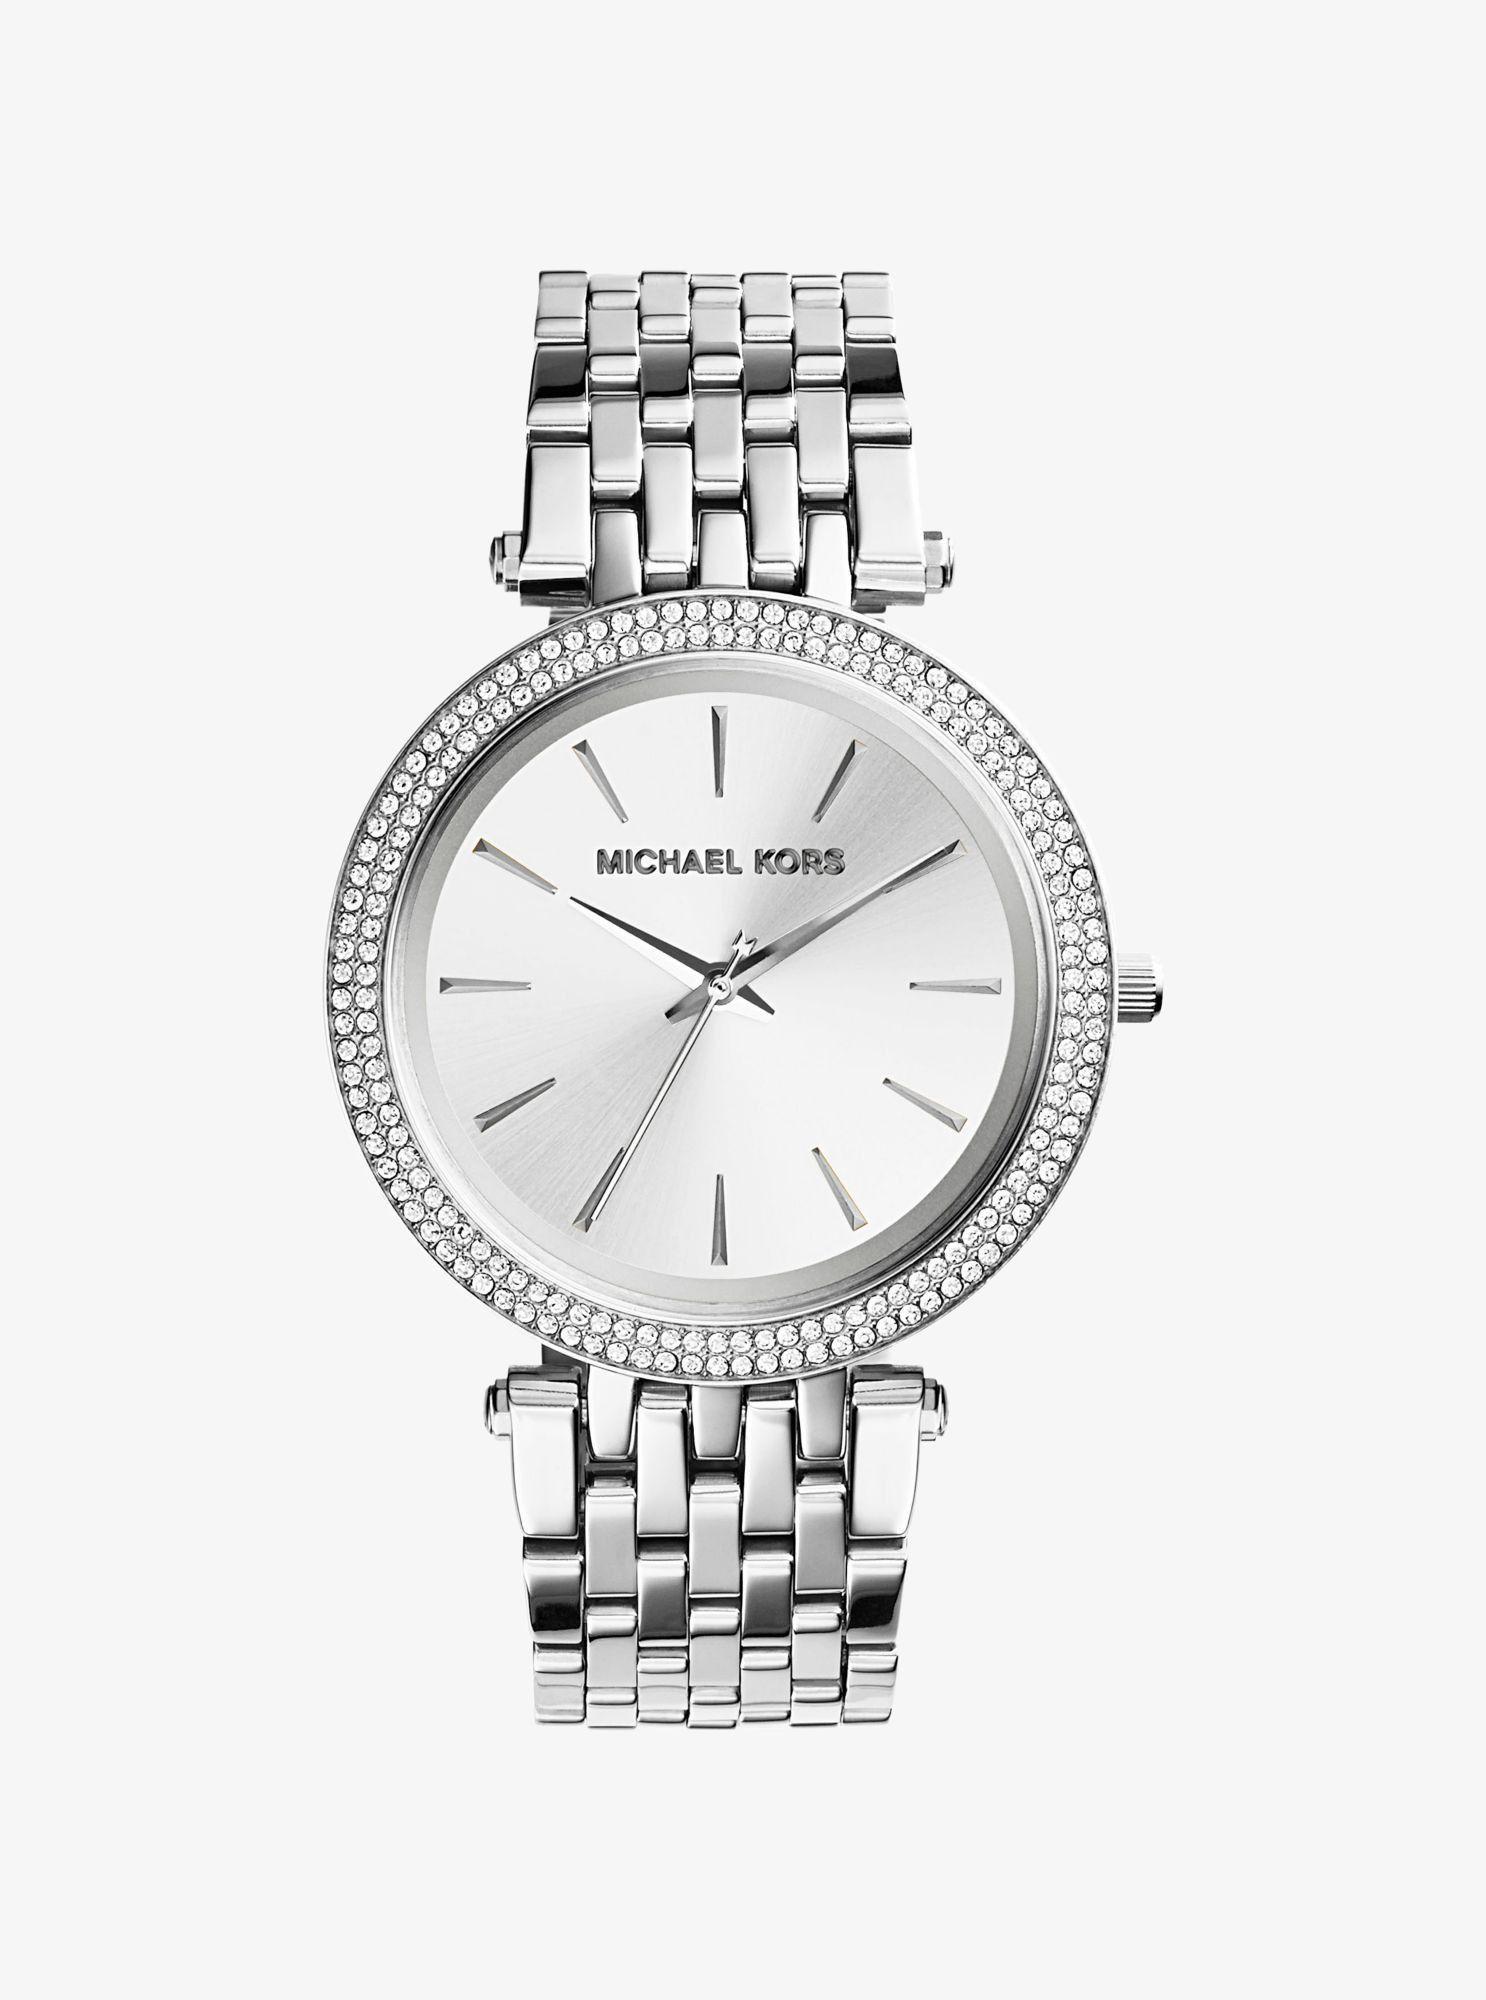 ed88b719c4ae MICHAEL KORS Darci Silver-Tone Watch.  michaelkors  all